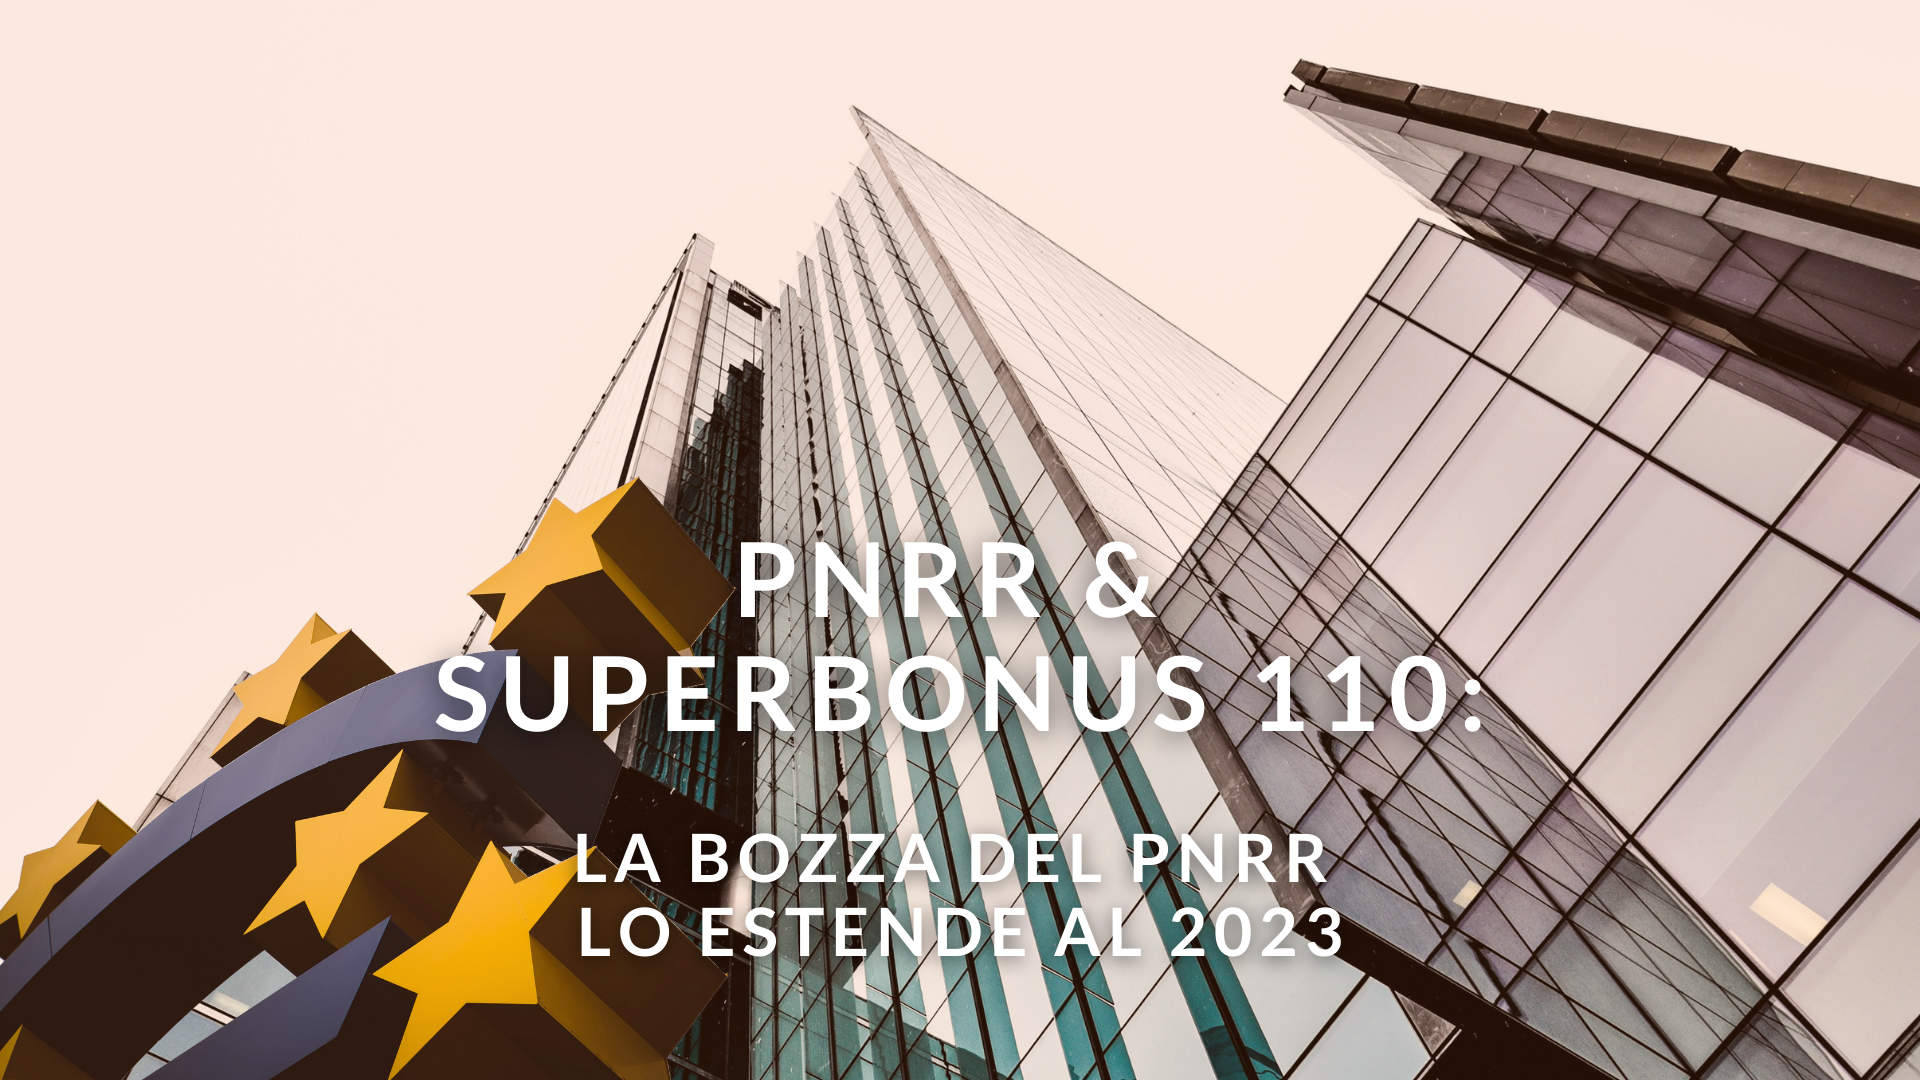 proroga-superbonus-110-la-bozza-del-pnrr-lo-estende-al-2023